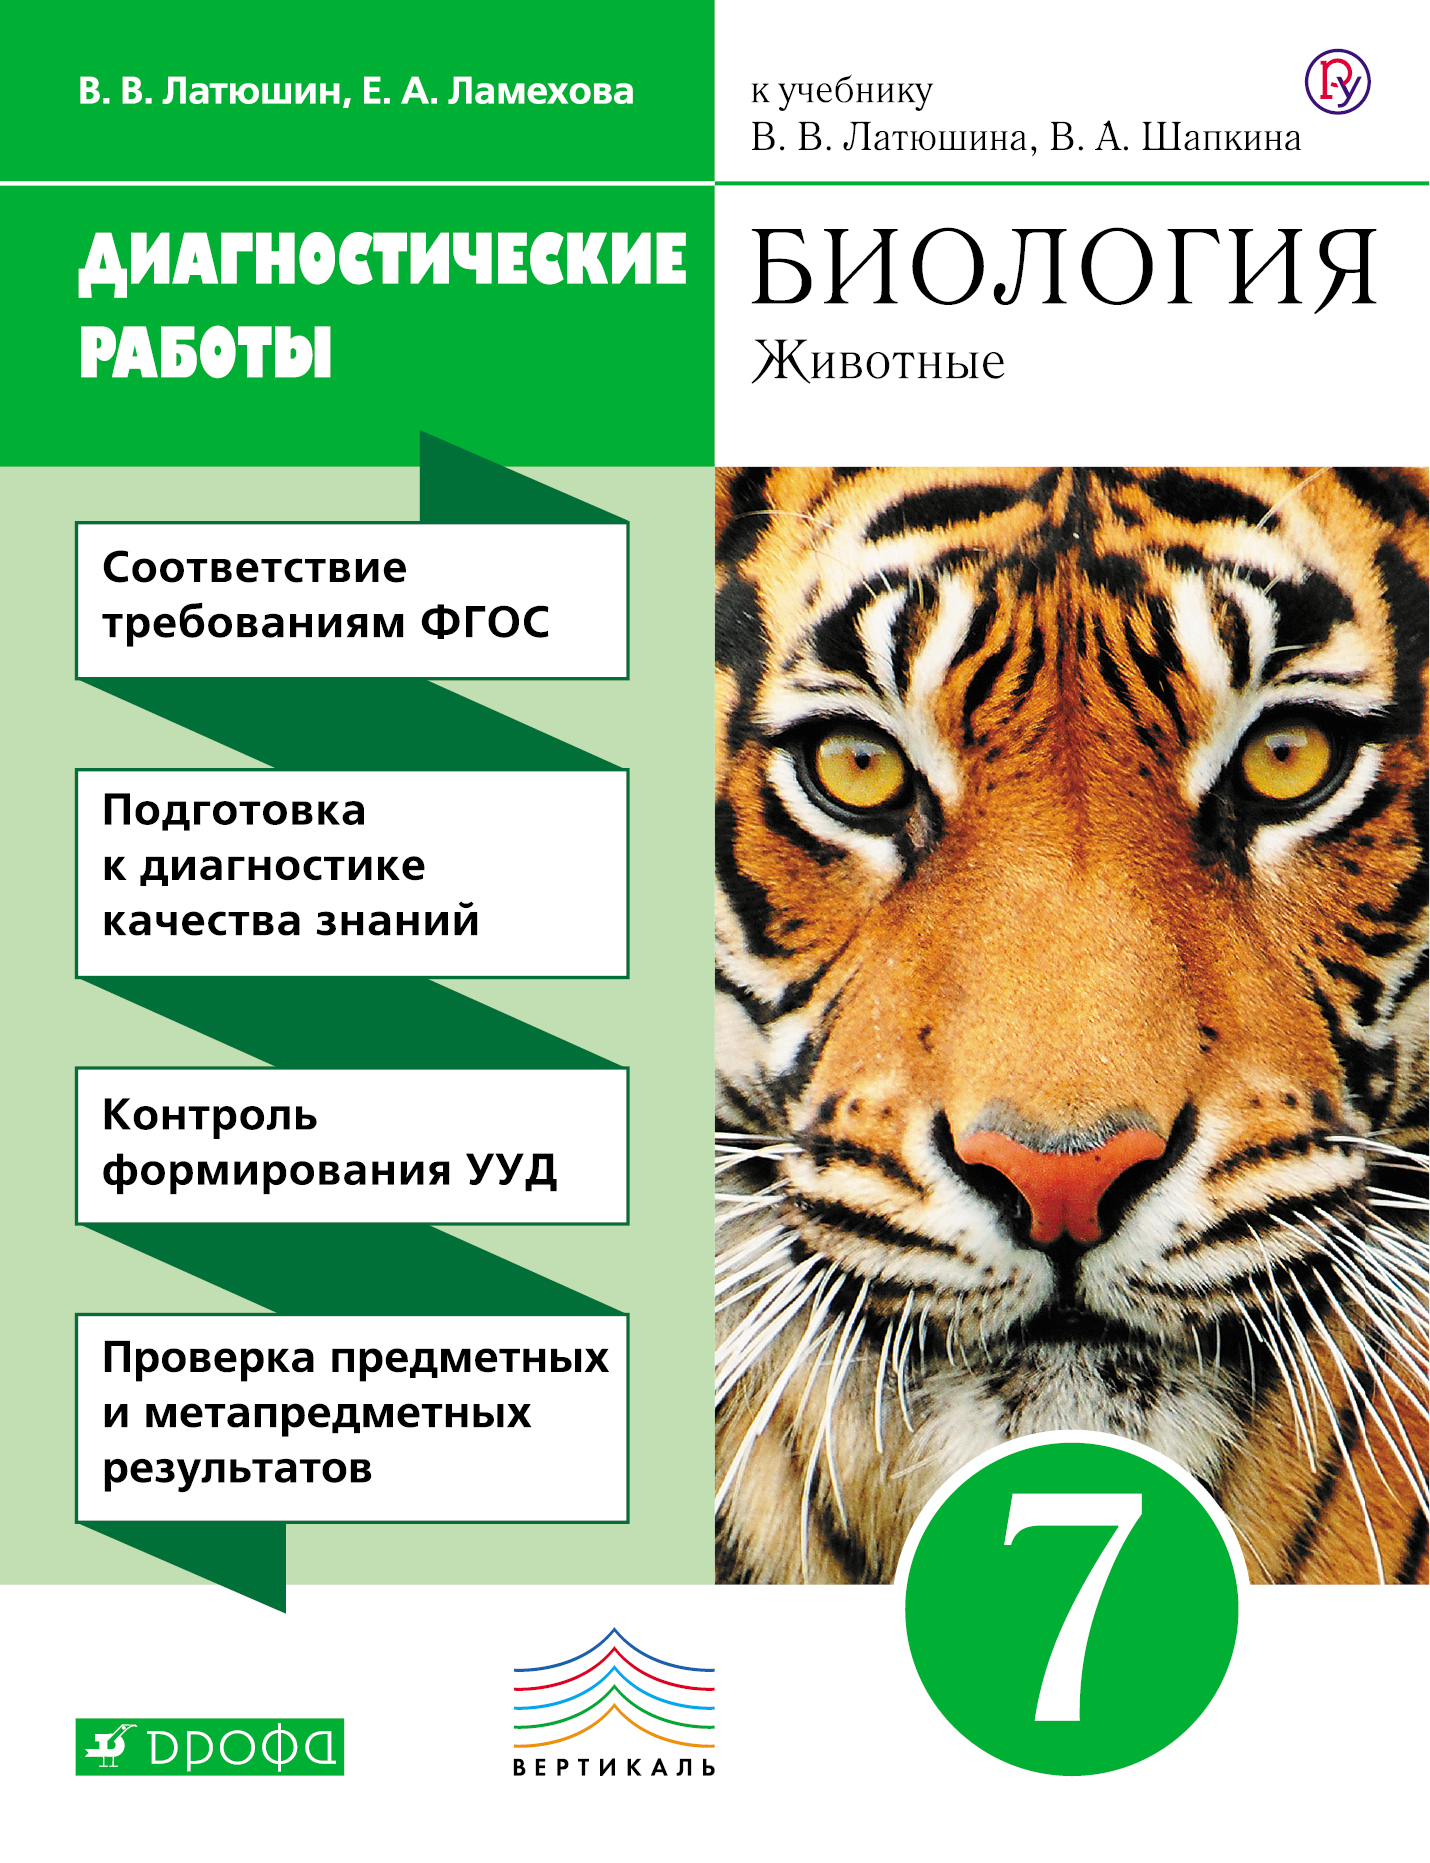 Фото - Латюшин В.В., Ламехова Е.А. Биология. 7 класс. Животные. Диагностические работы. в в латюшин г а уфимцева биология животные 7 класс